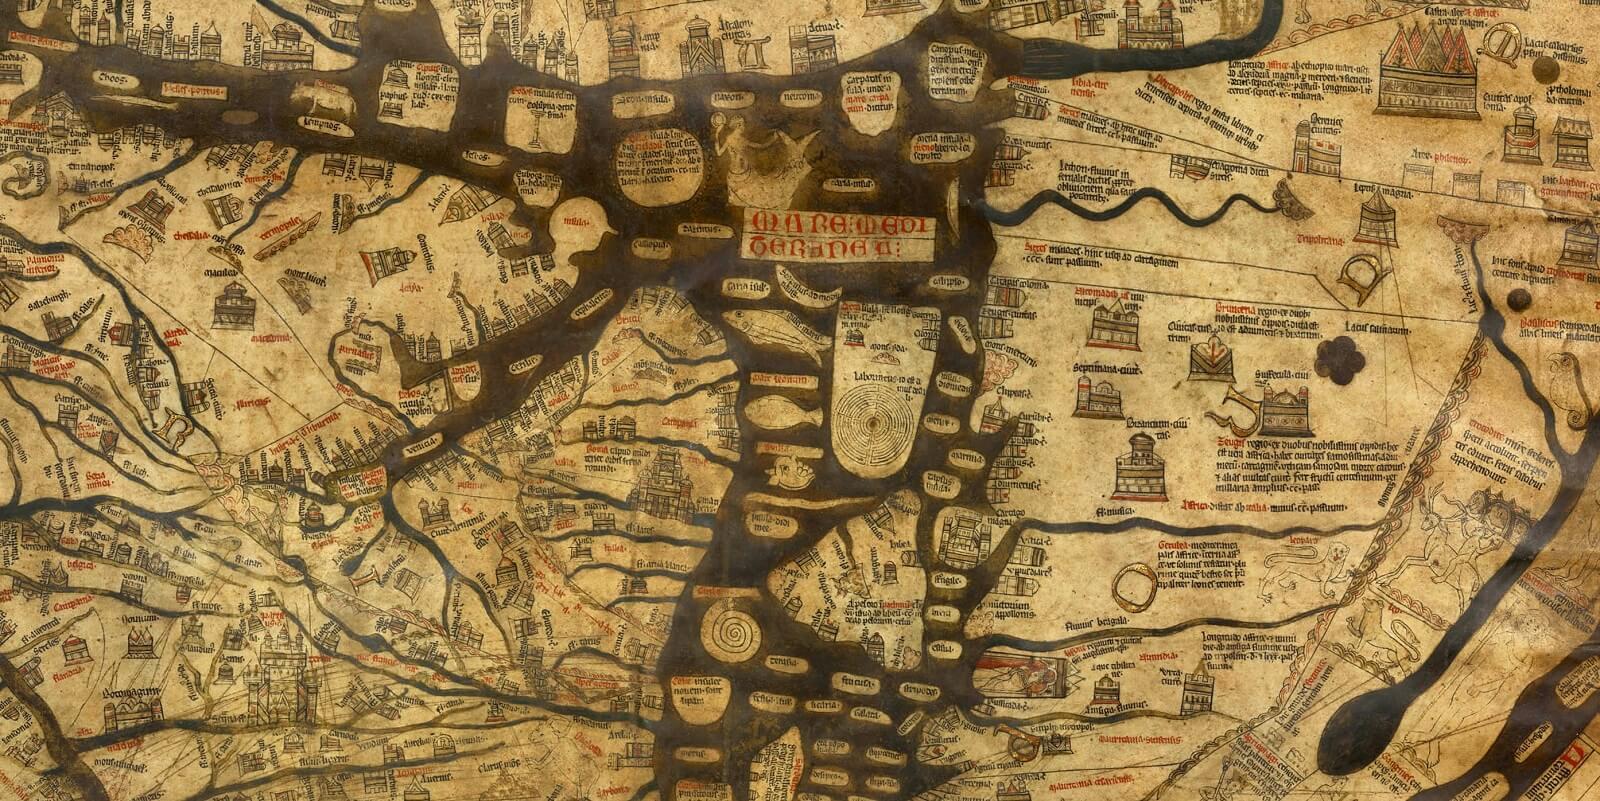 Mappa Mundi di Hereford